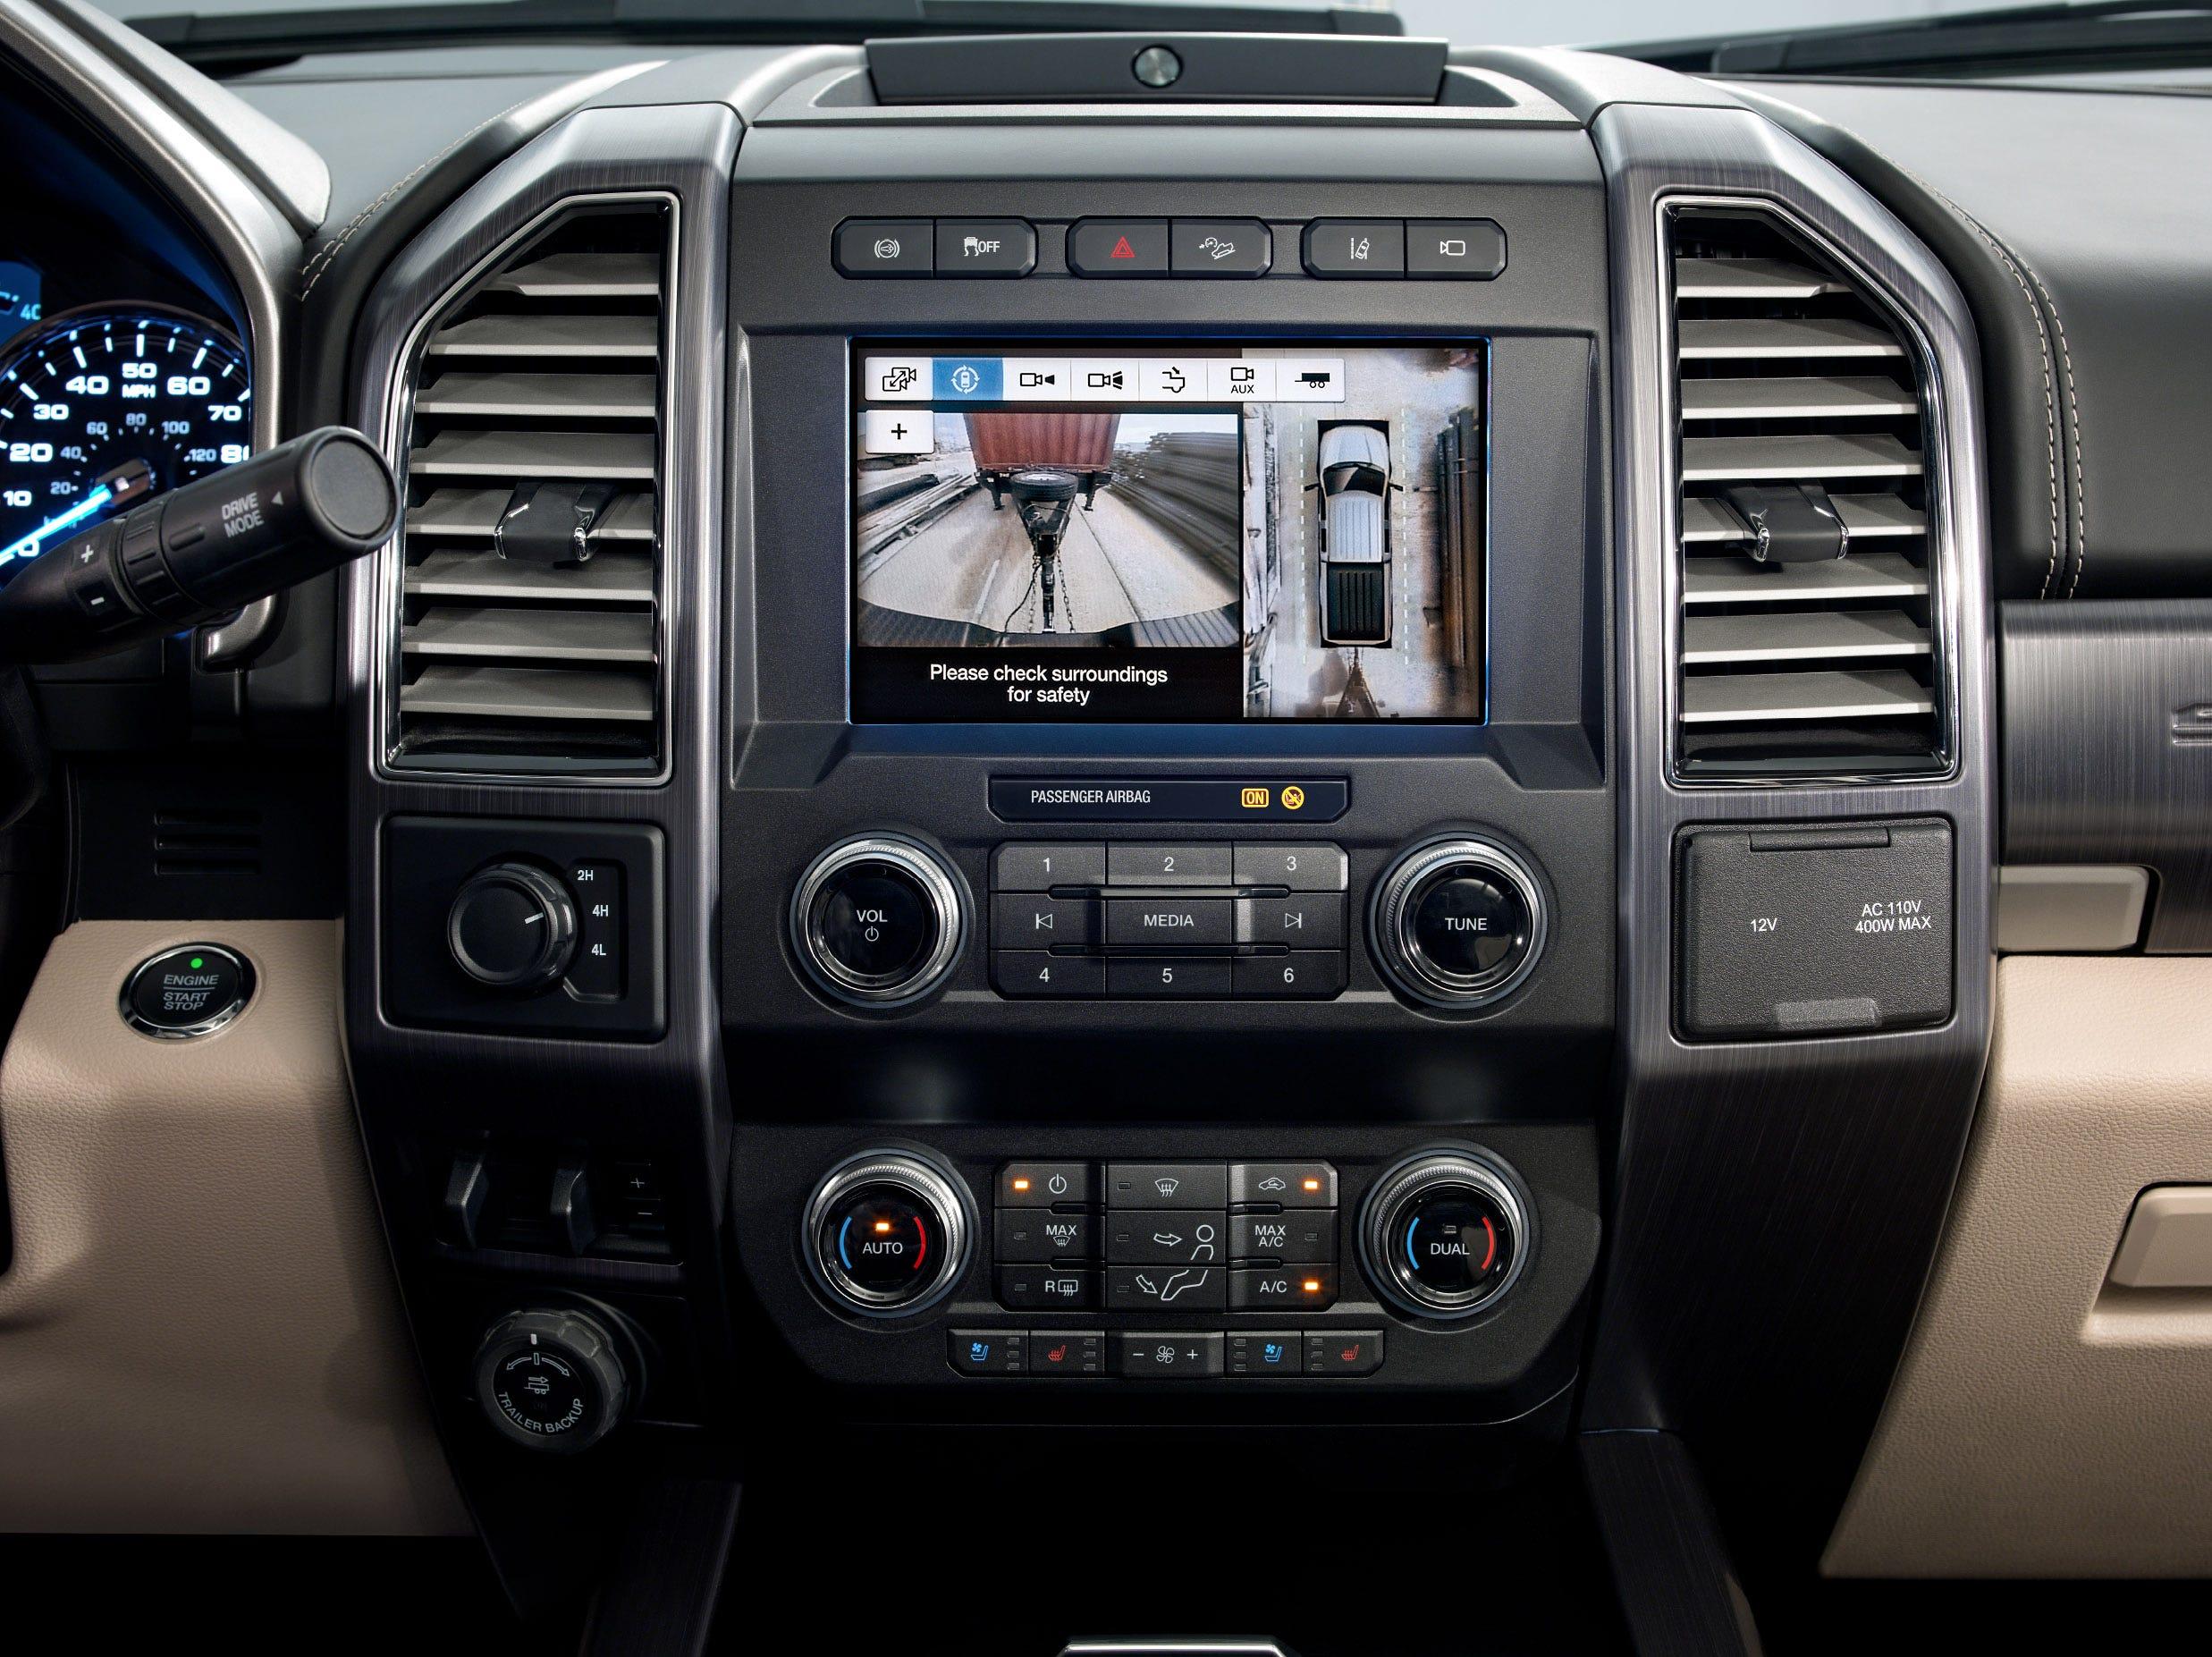 Ford Super Duty backup camera display.